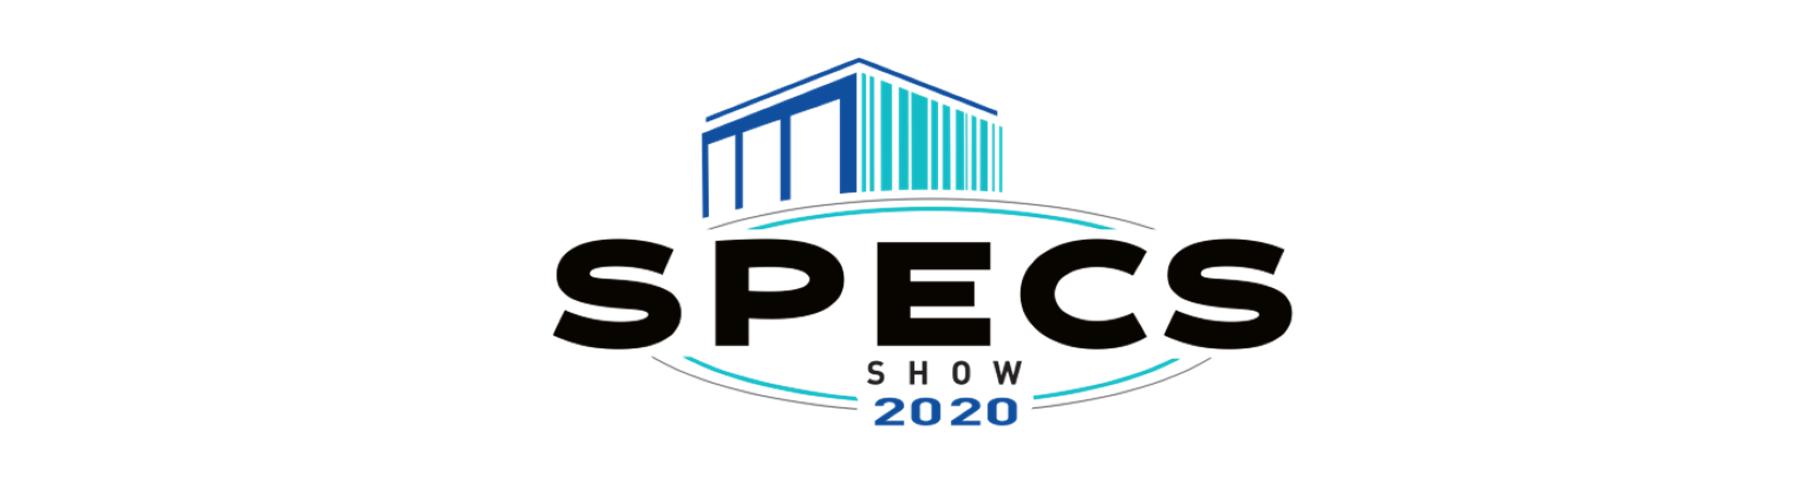 Thomas Grace Attending SPECS 2020!